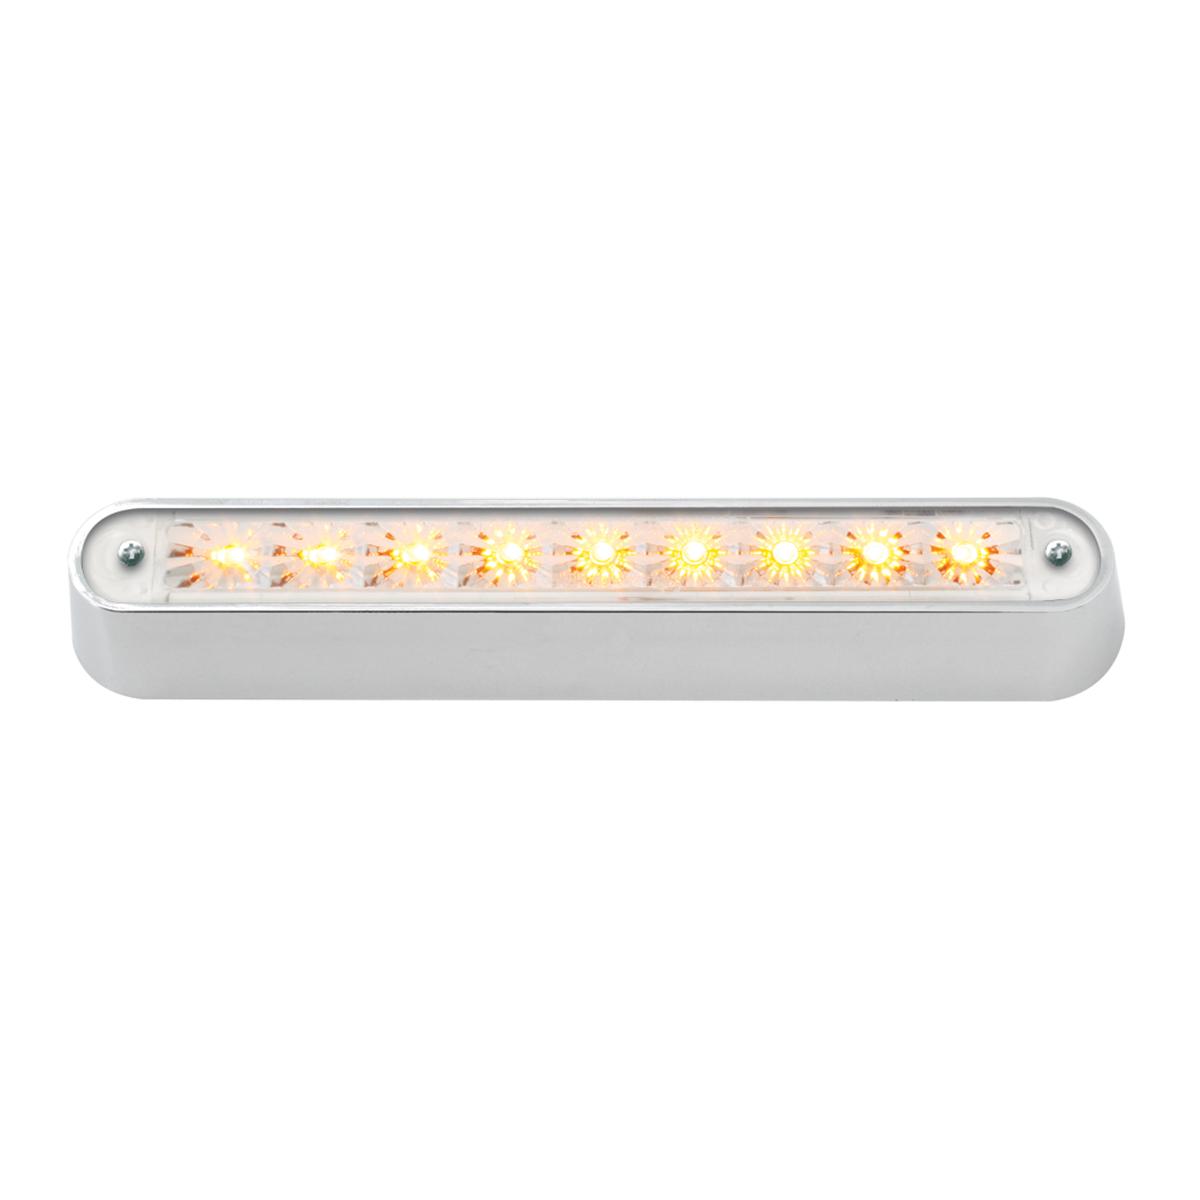 "76091 6.5"" Surface Mount LED Light Bar w/ Chrome Plastic Base"